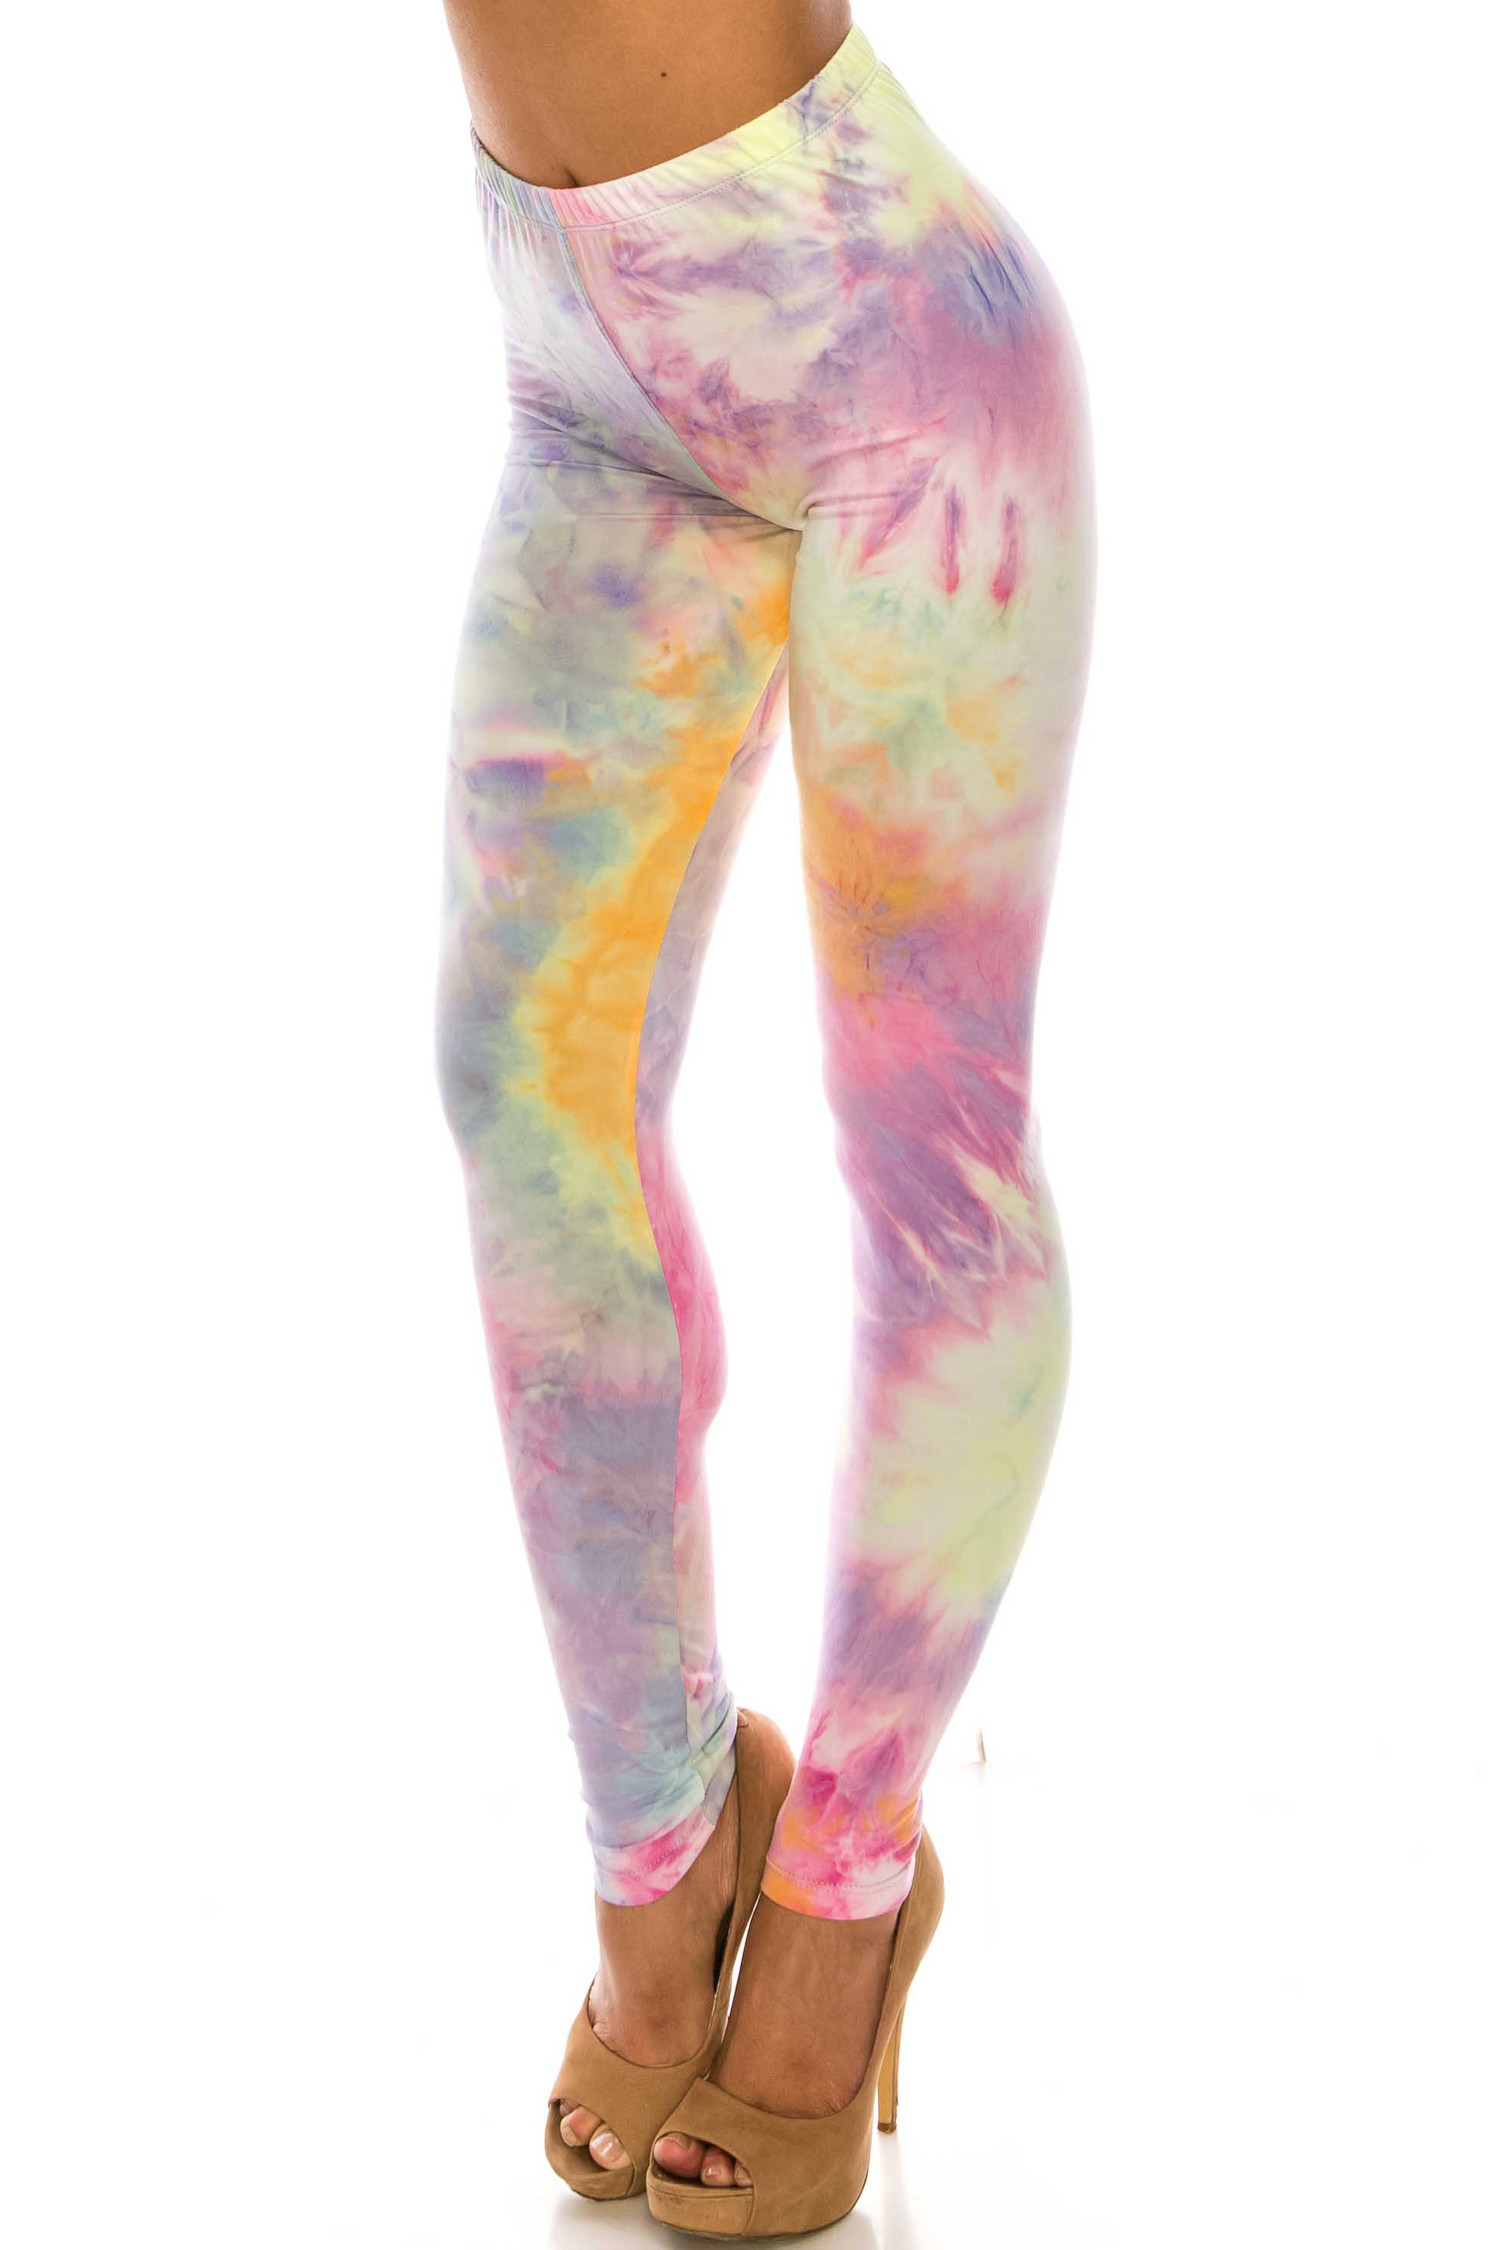 Buttery Soft Multi-Color Pastel Tie Dye Extra Plus Size Leggings - 3X-5X